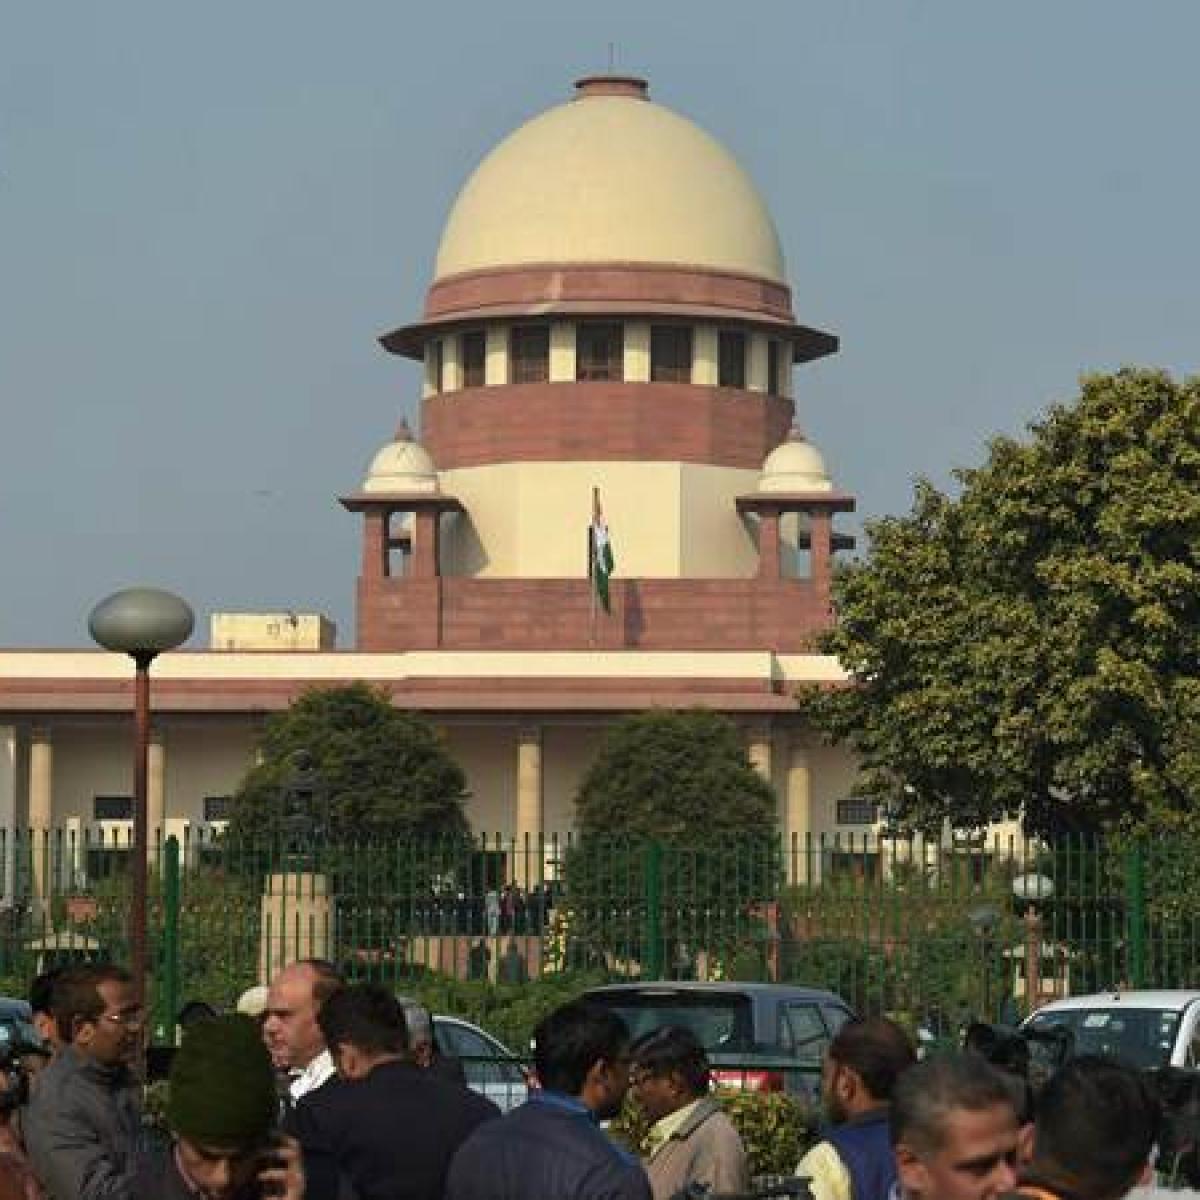 Kashmir Times Editor seeks urgent plea hearing for removal of media restrictions in J&K